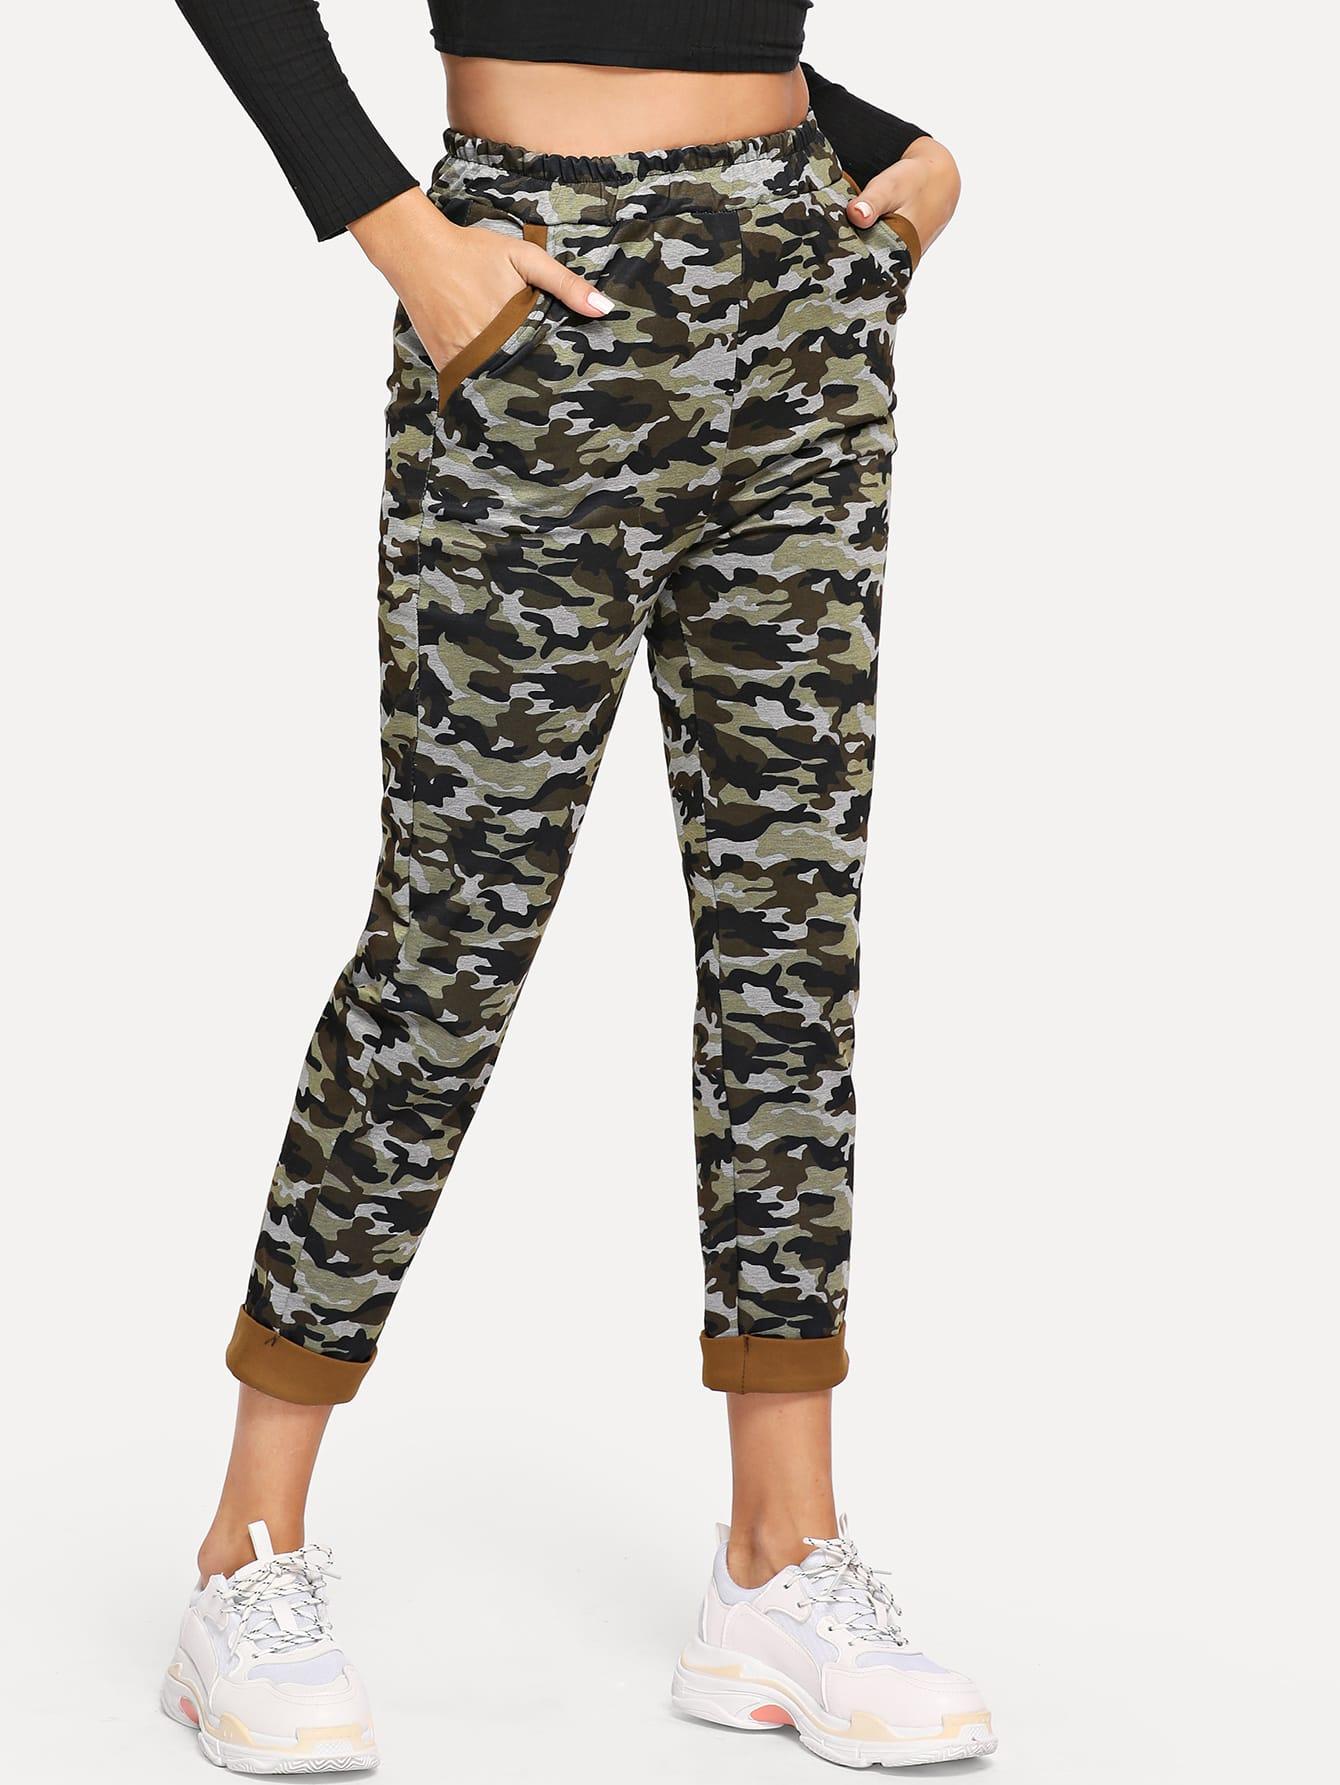 Camouflage Print Elastic Waist Pants Camouflage Print Elastic Waist Pants